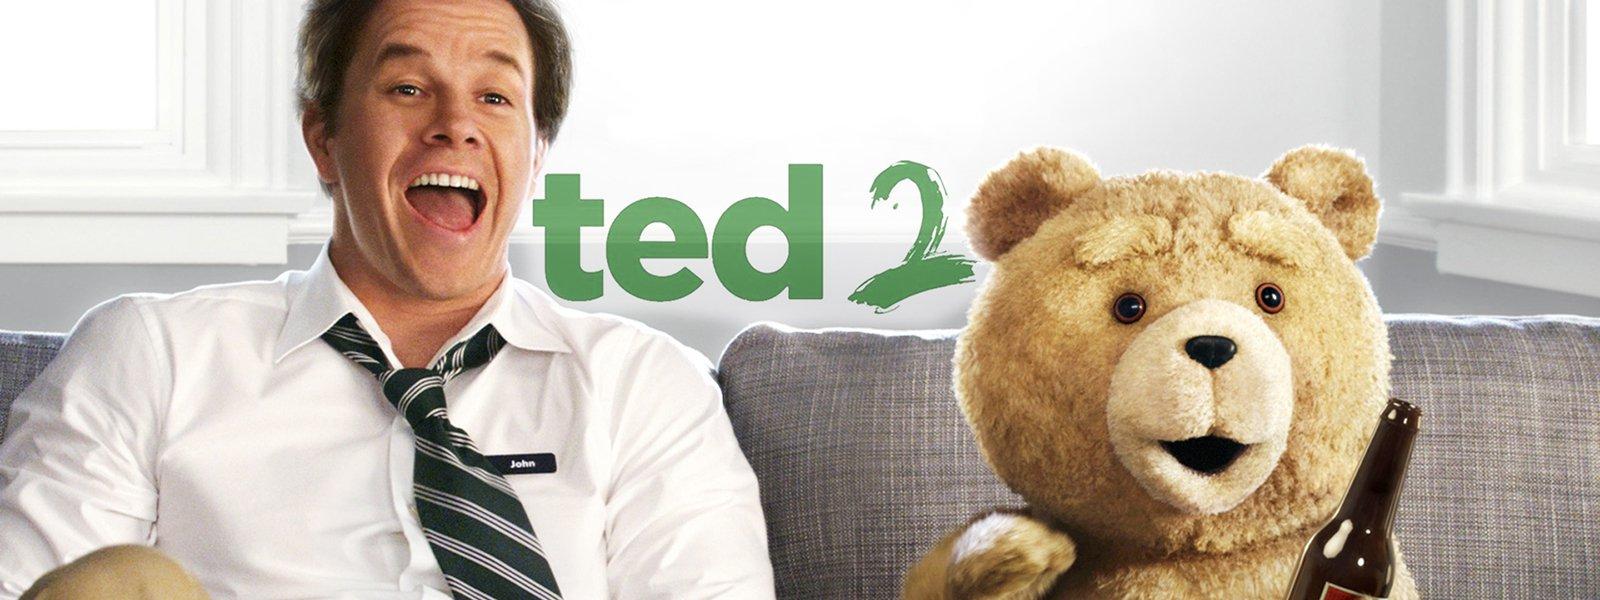 Chú Gấu Ted 2 - Ted 2 - 2015